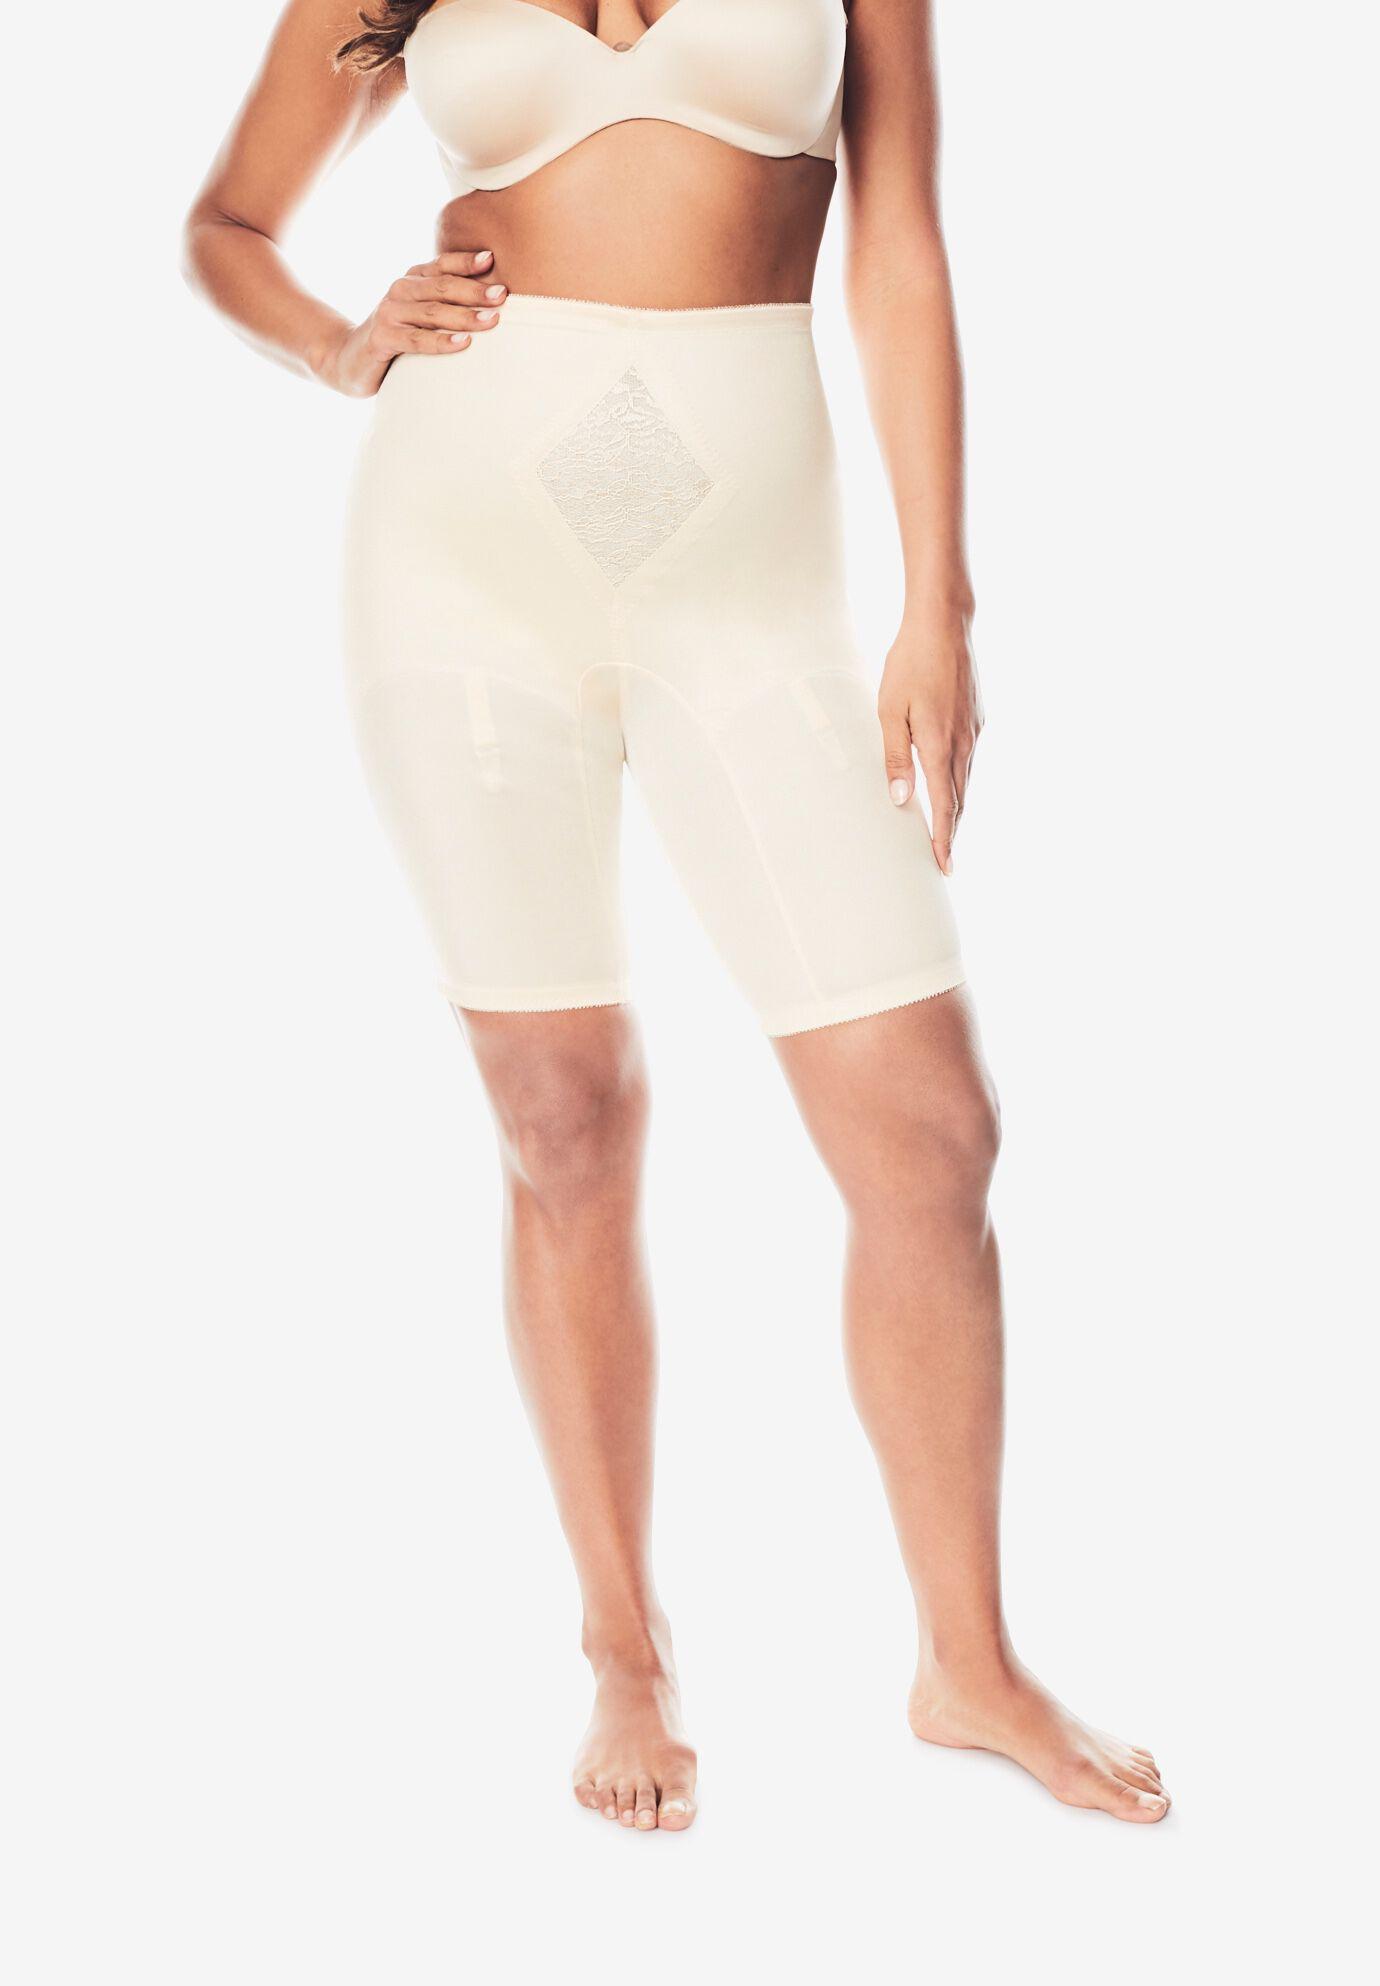 Cortland Foundations Womens Plus Size Cortland Intimates Firm Control Capri Pant Liner #7611